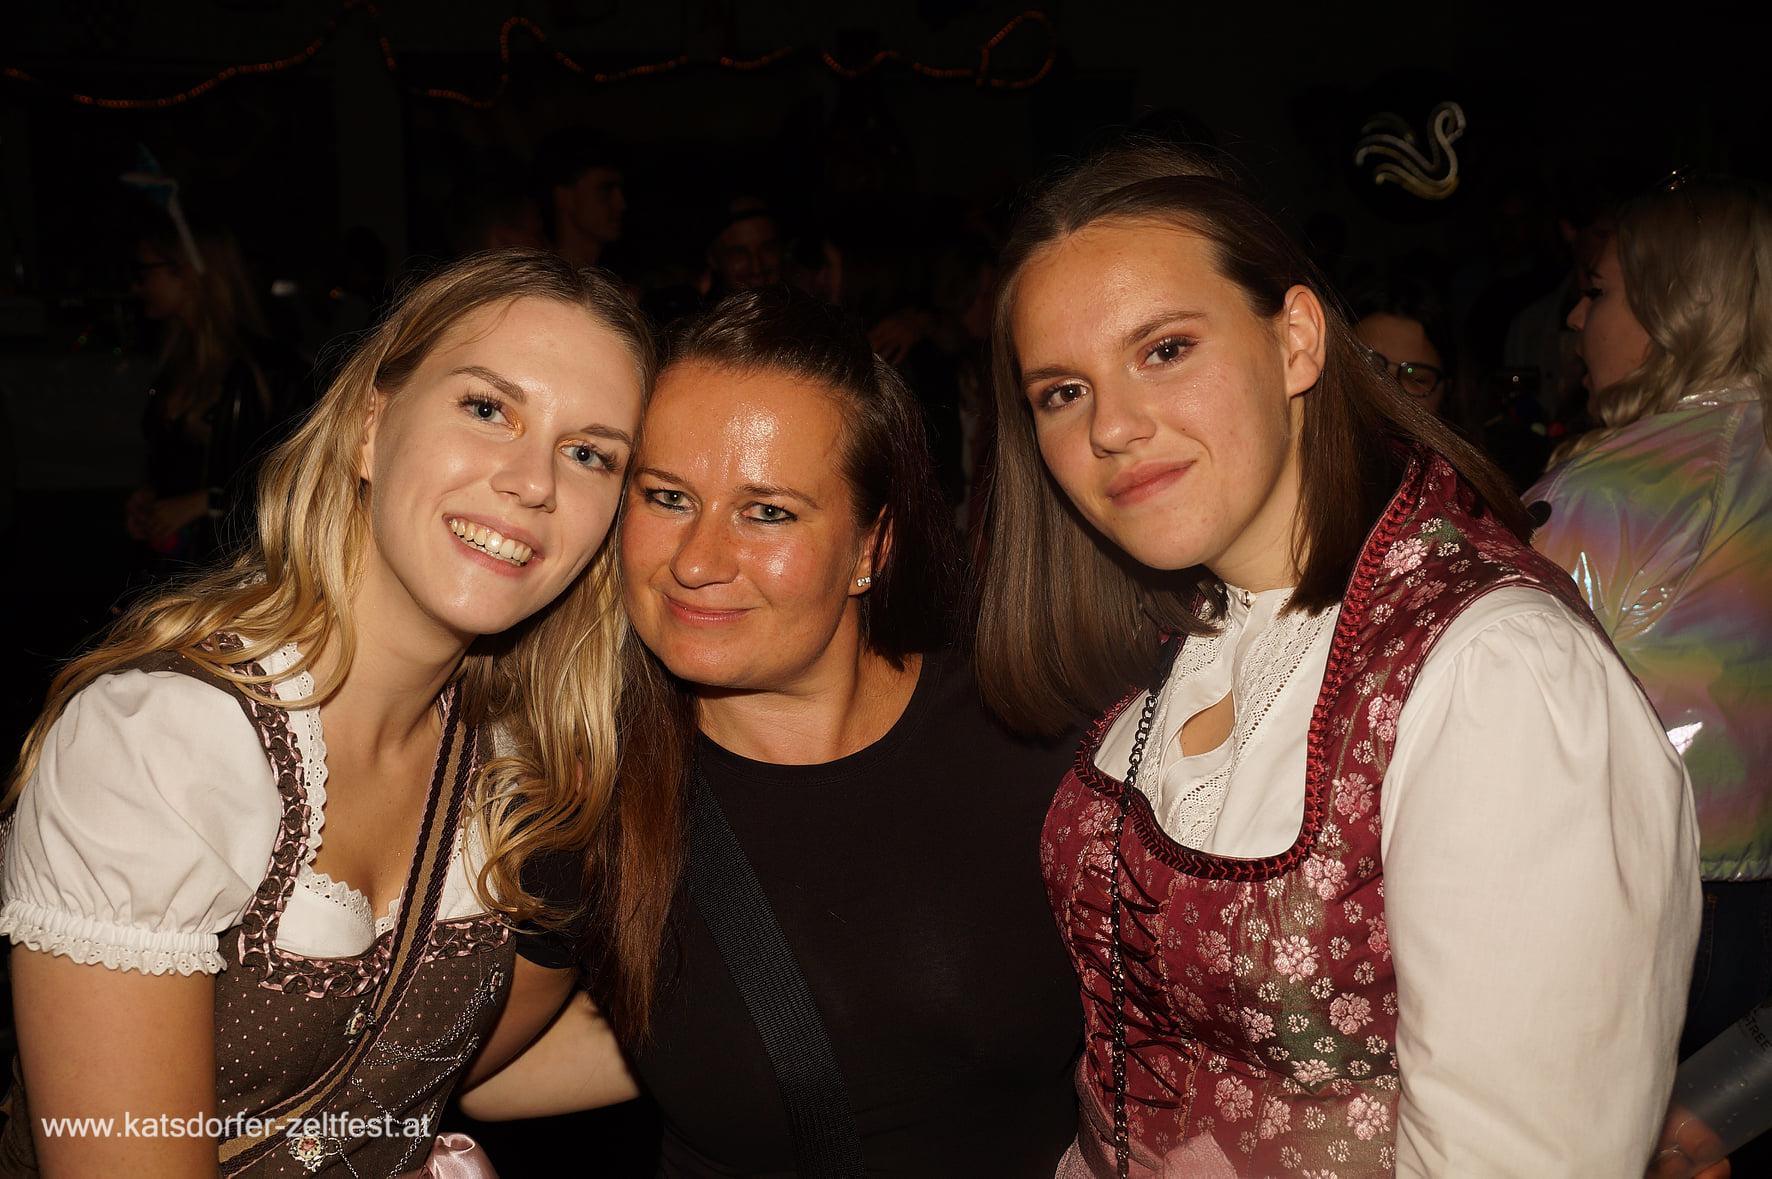 Katsdorfer Zeltfest 2021